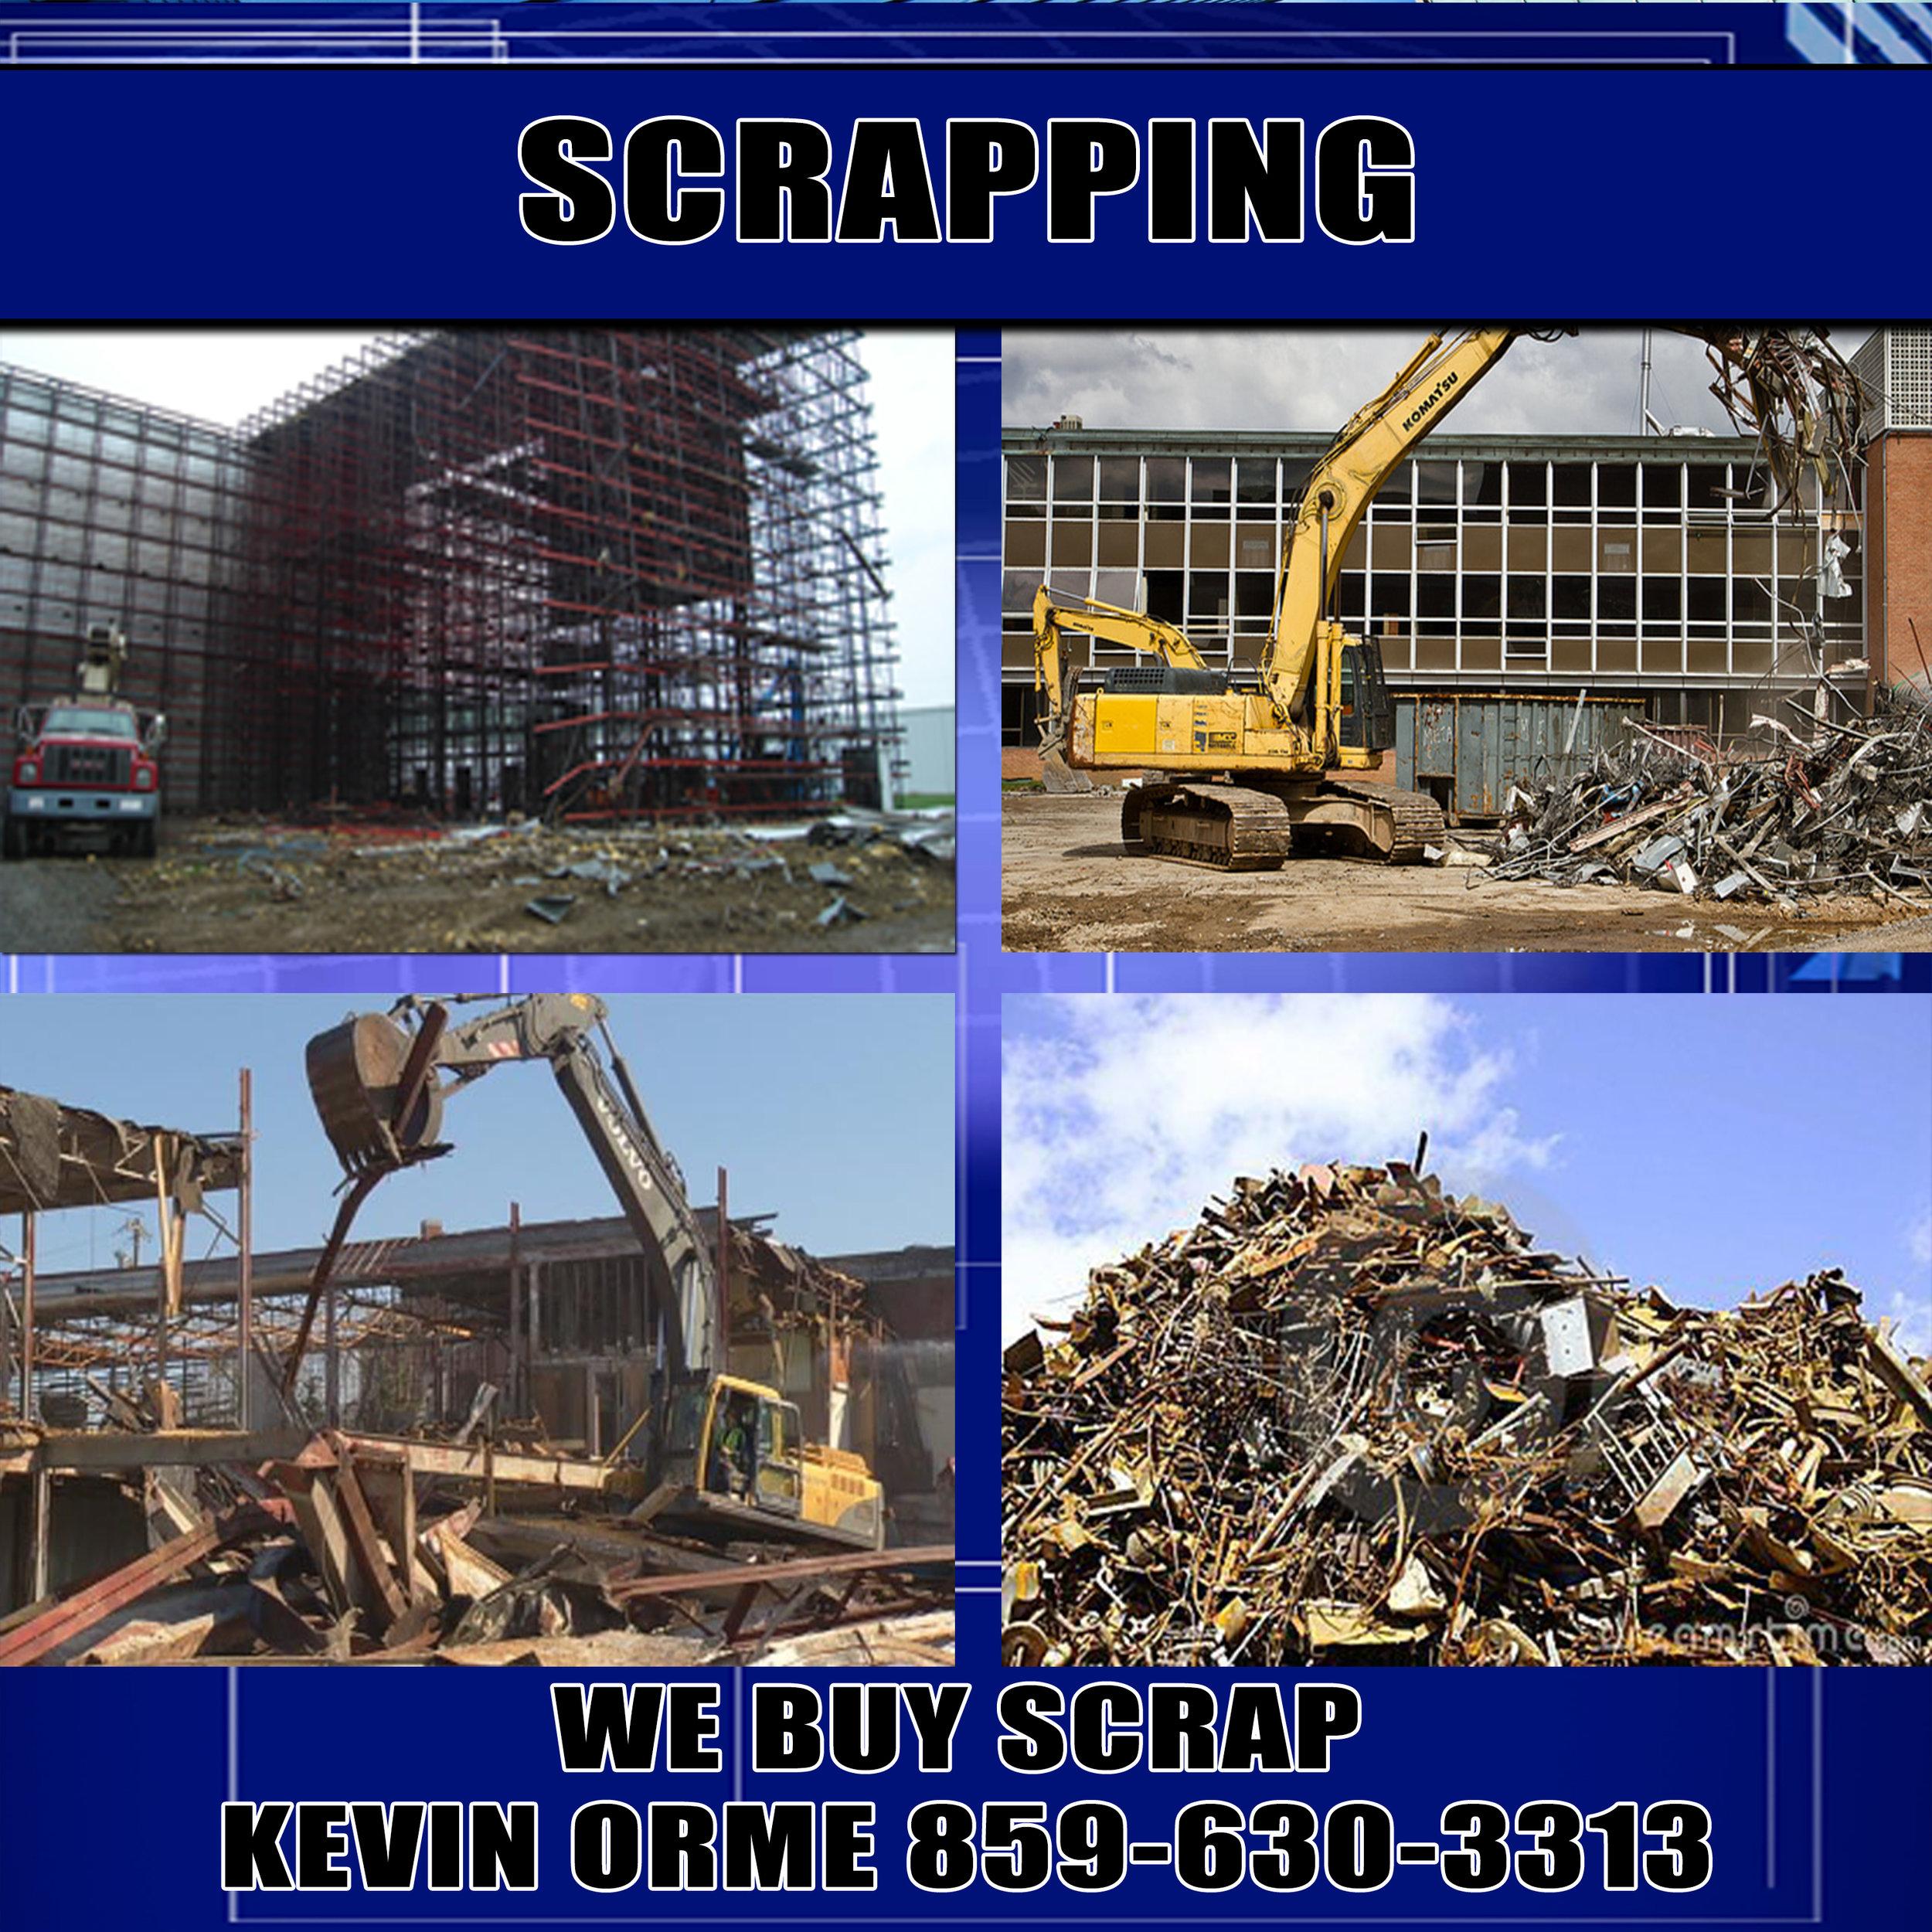 8_Scrapping.jpg